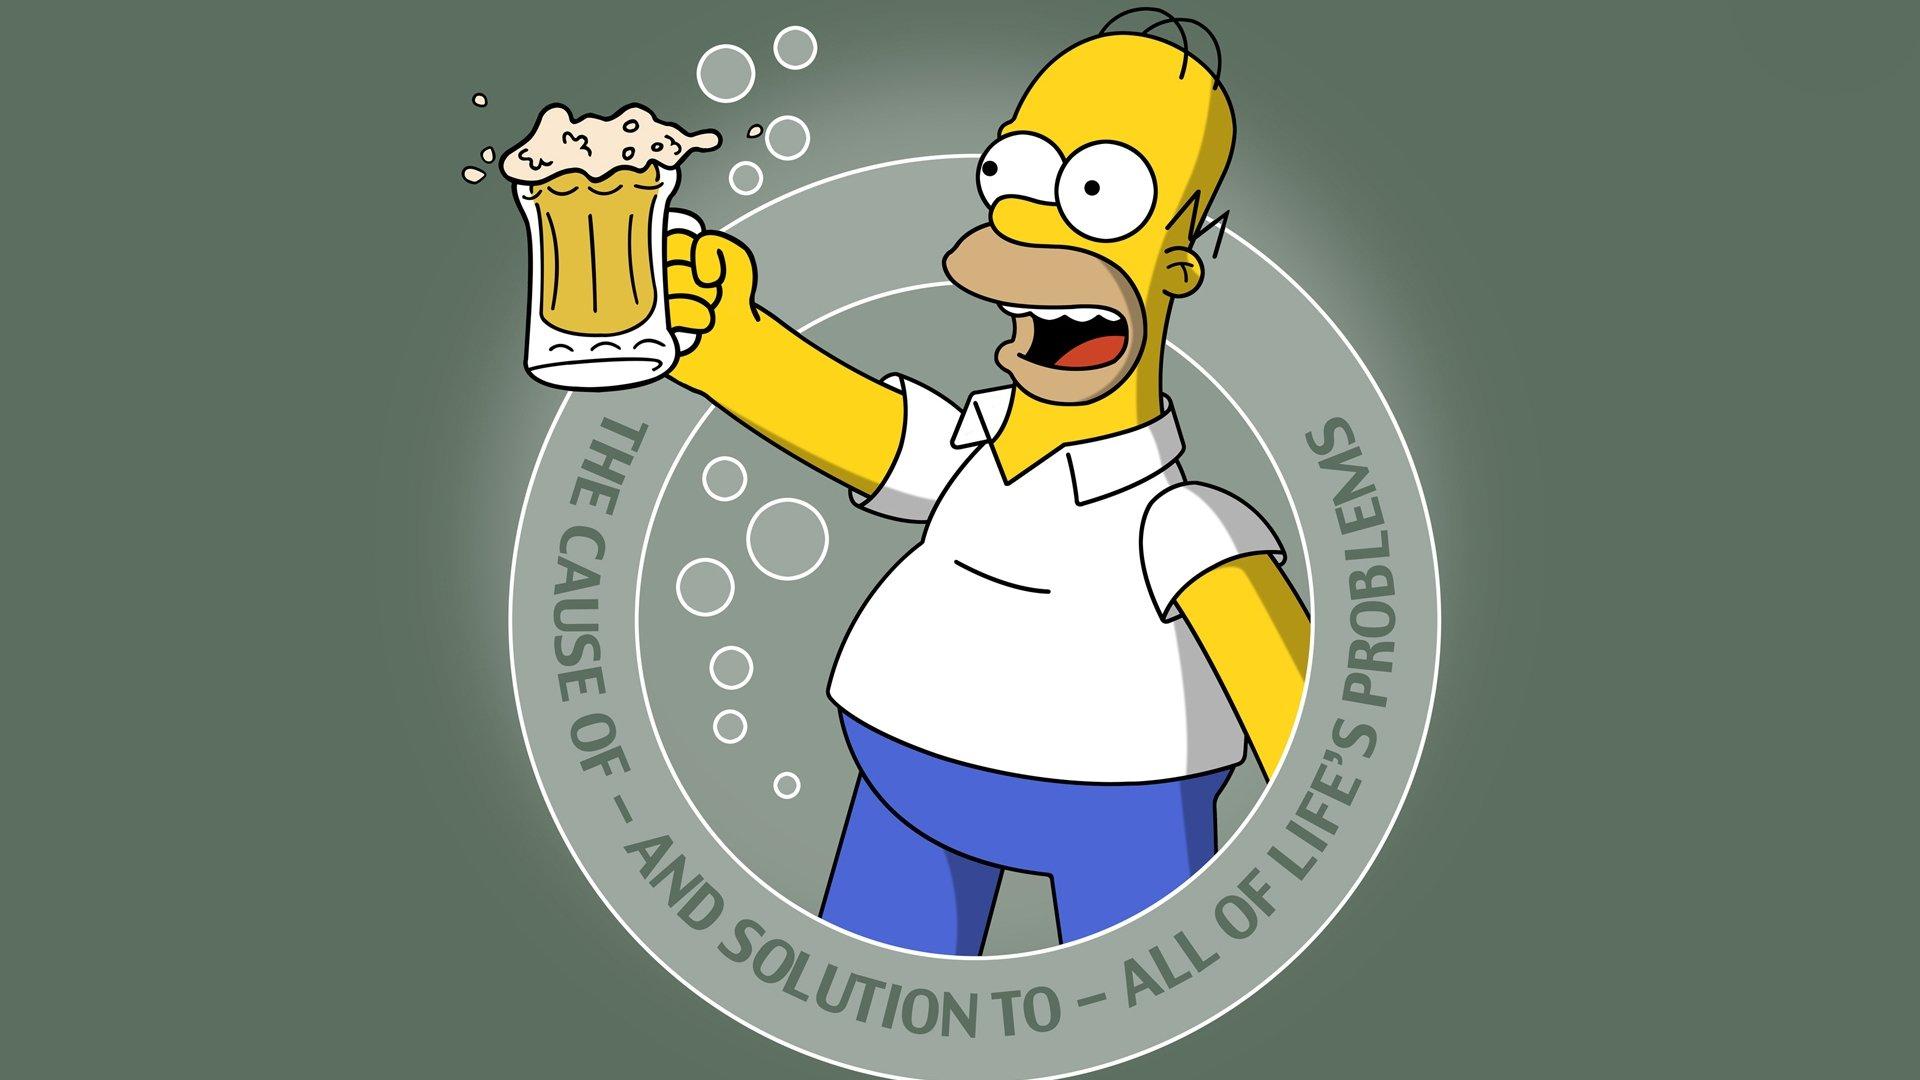 The Simpsons Wallpapers 1920x1080 Full Hd 1080p Desktop